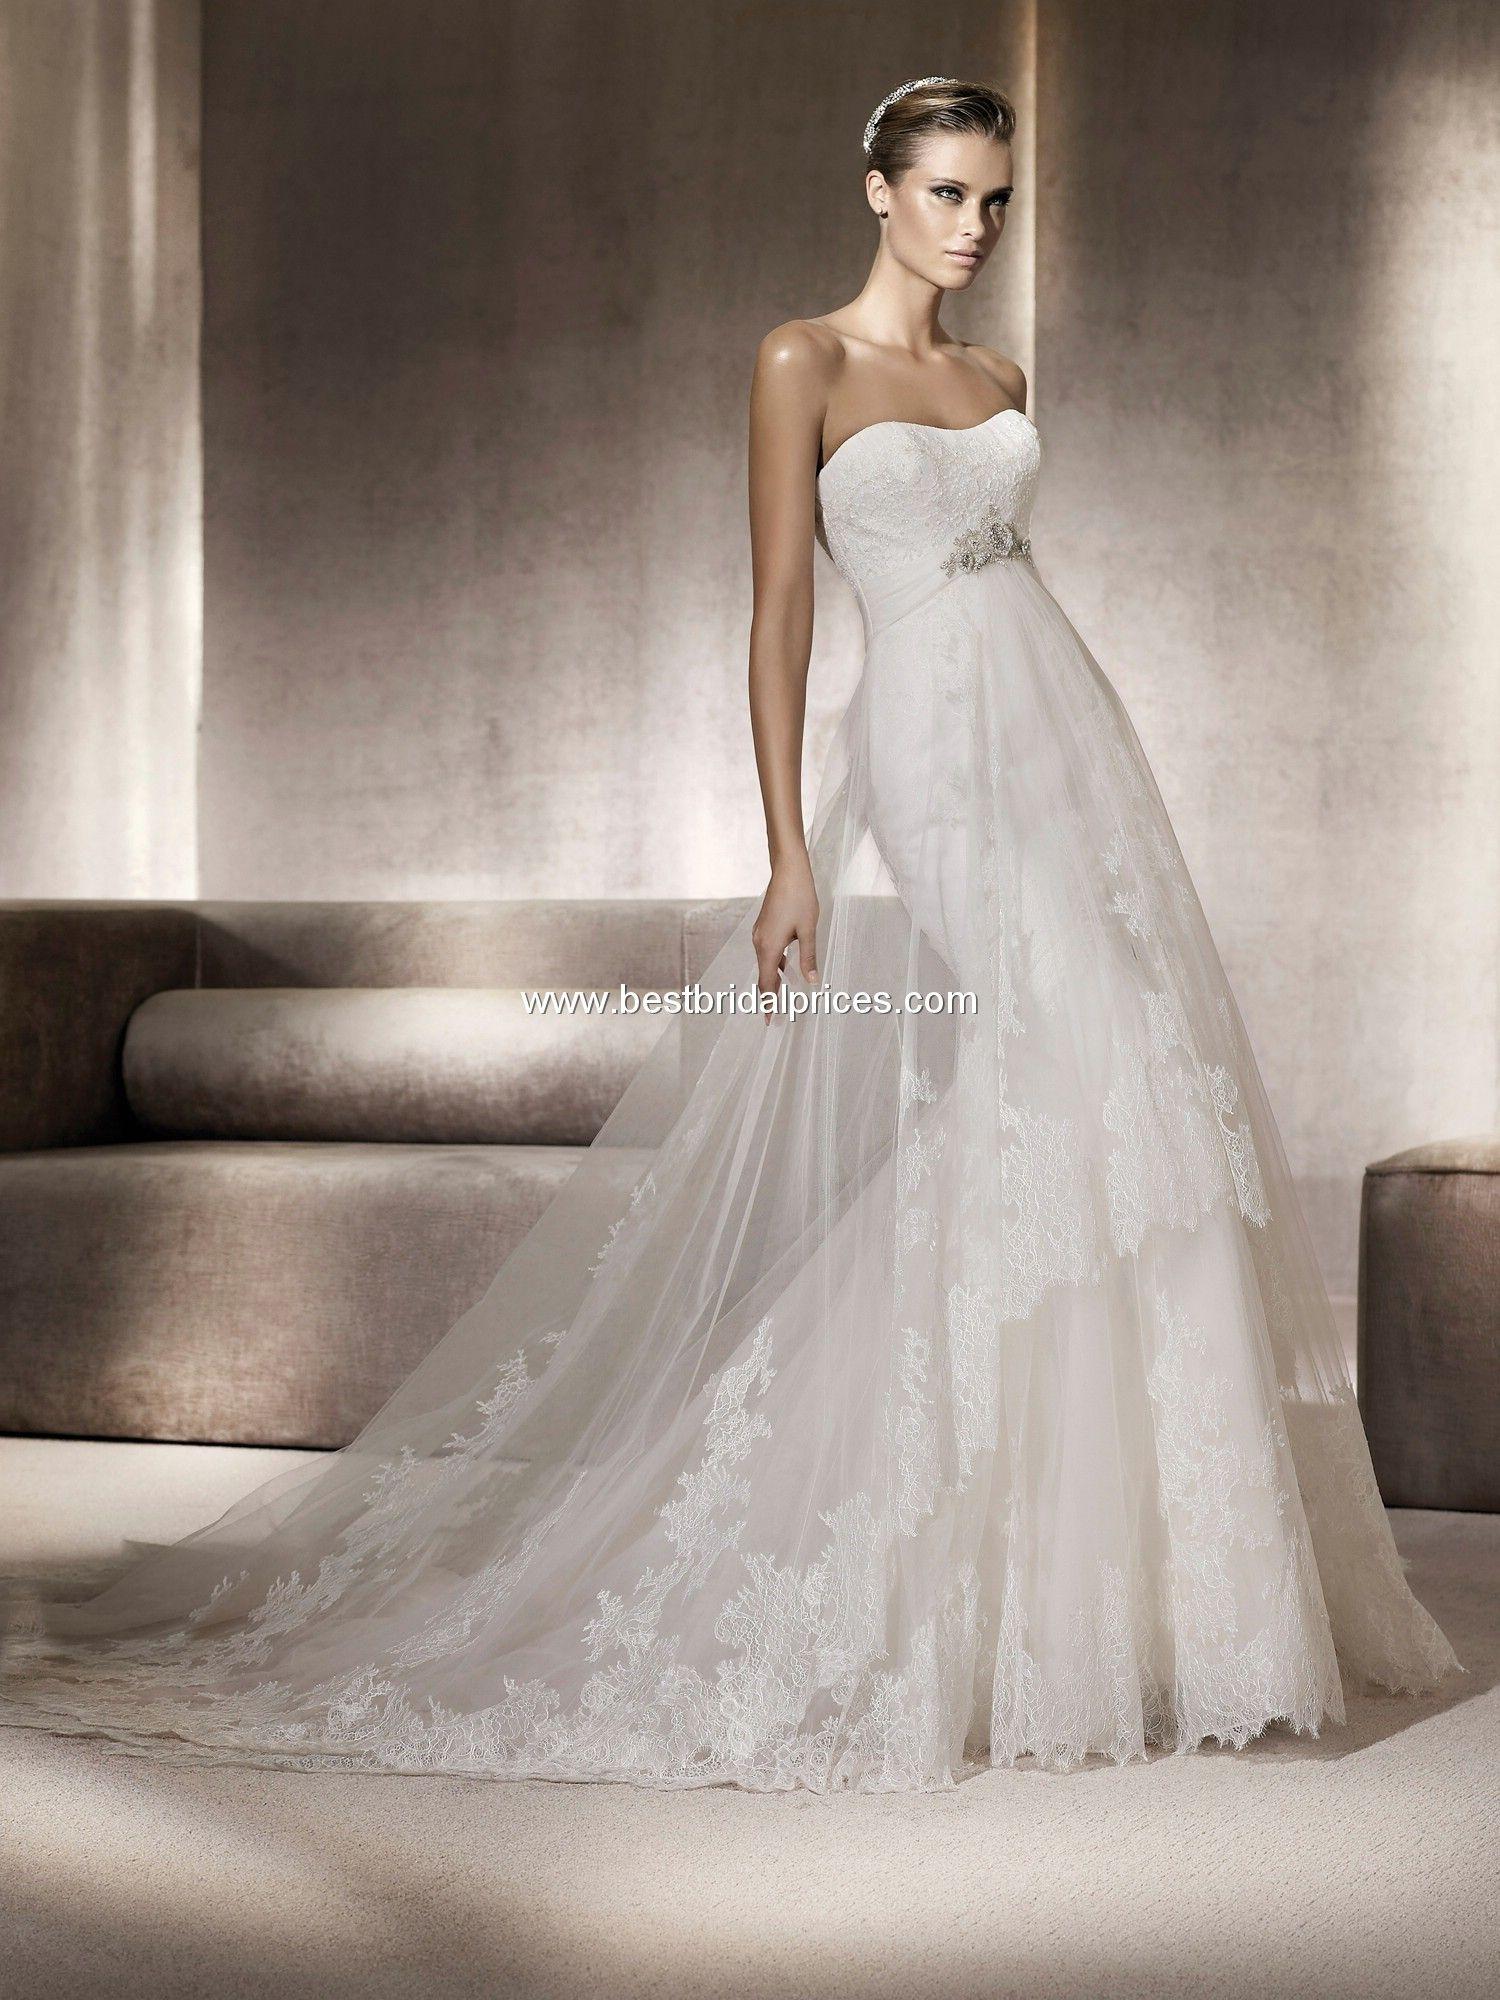 Pronovias Wedding Dresses - Style Pompeya Just saw this on I found ...